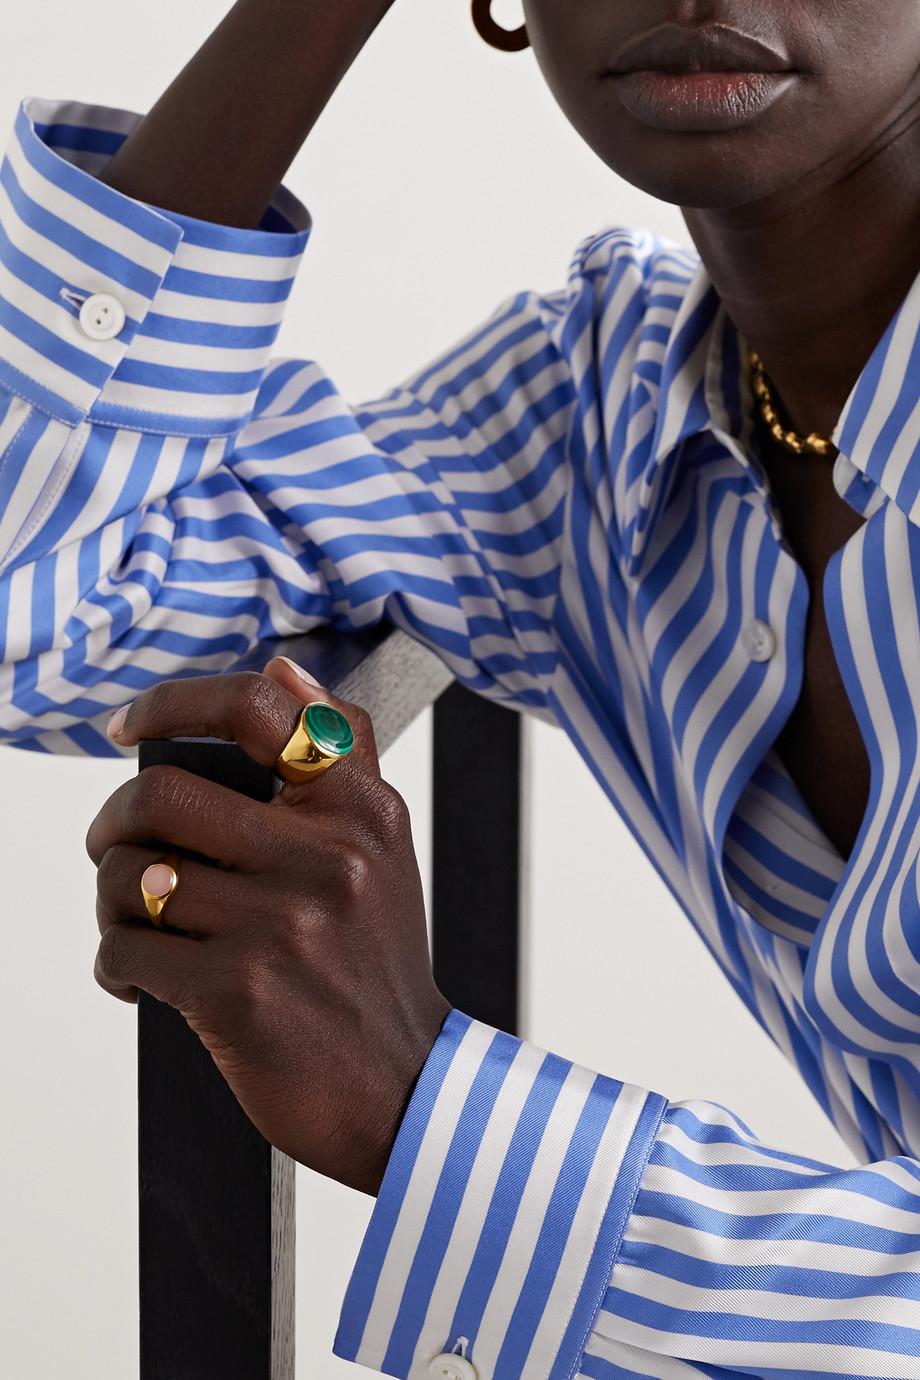 Rasa x Anna Beck Large gold-plated malachite ring